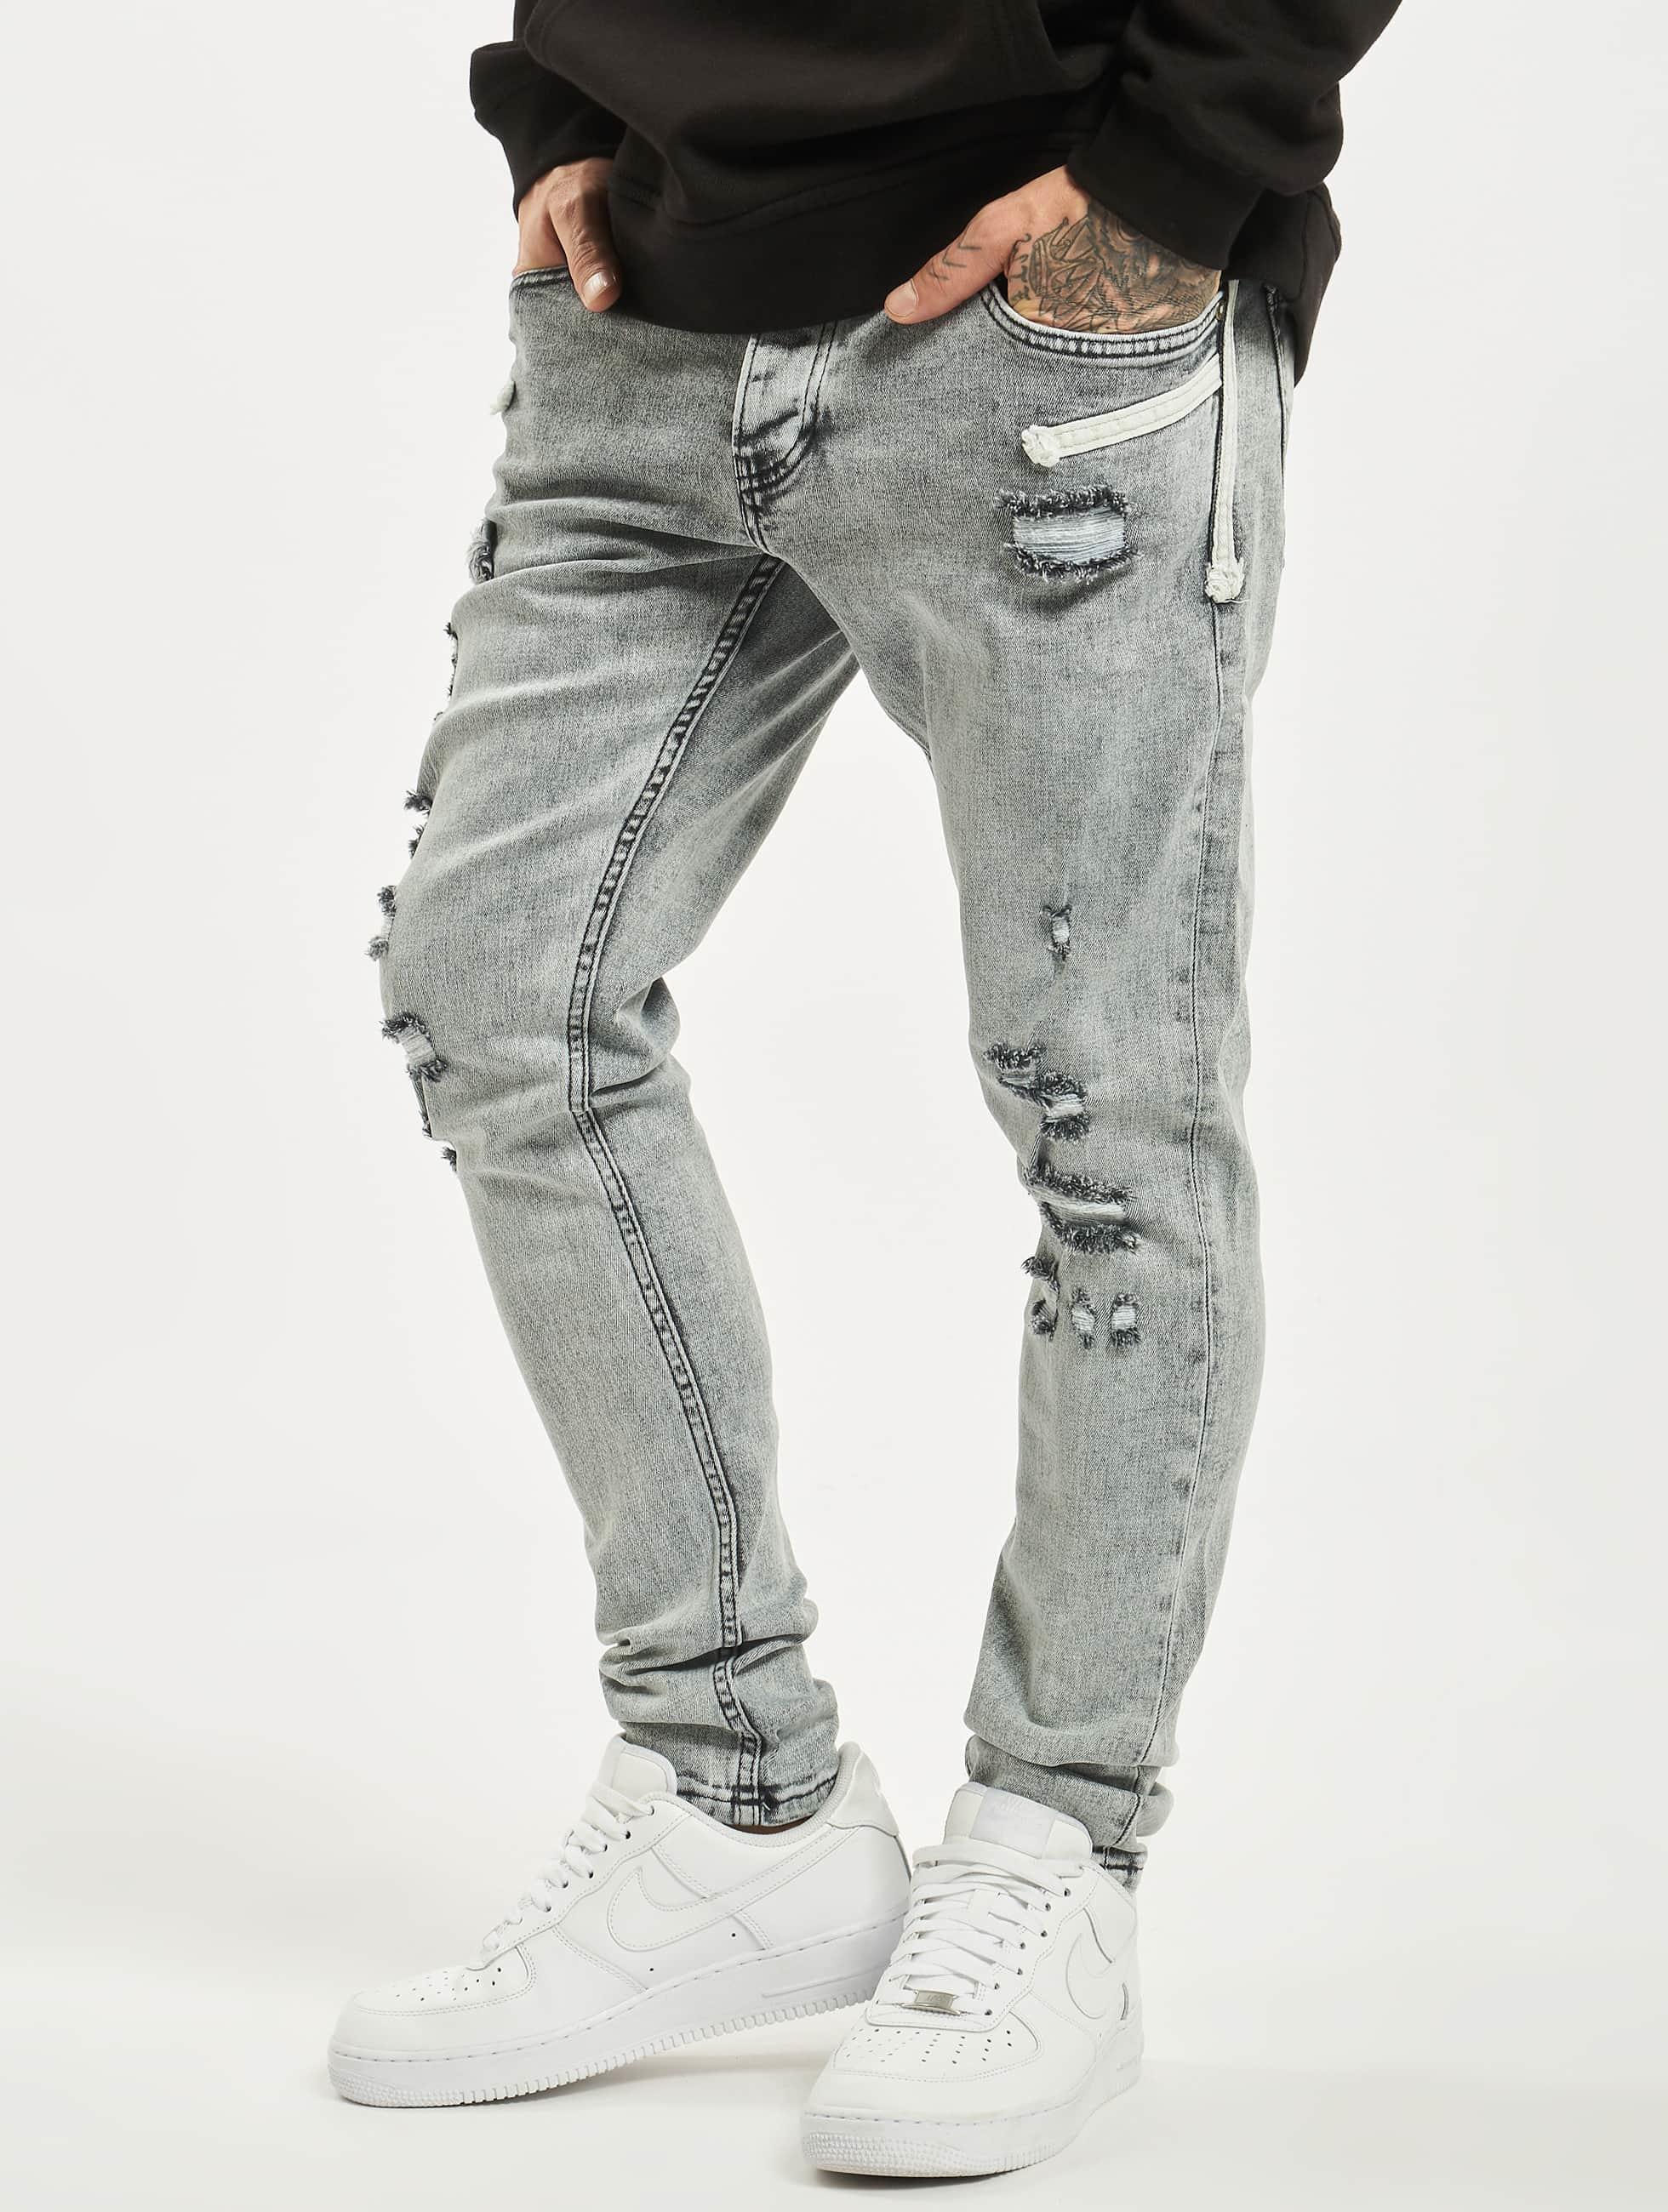 2Y / Slim Fit Jeans Malik in grey W 33